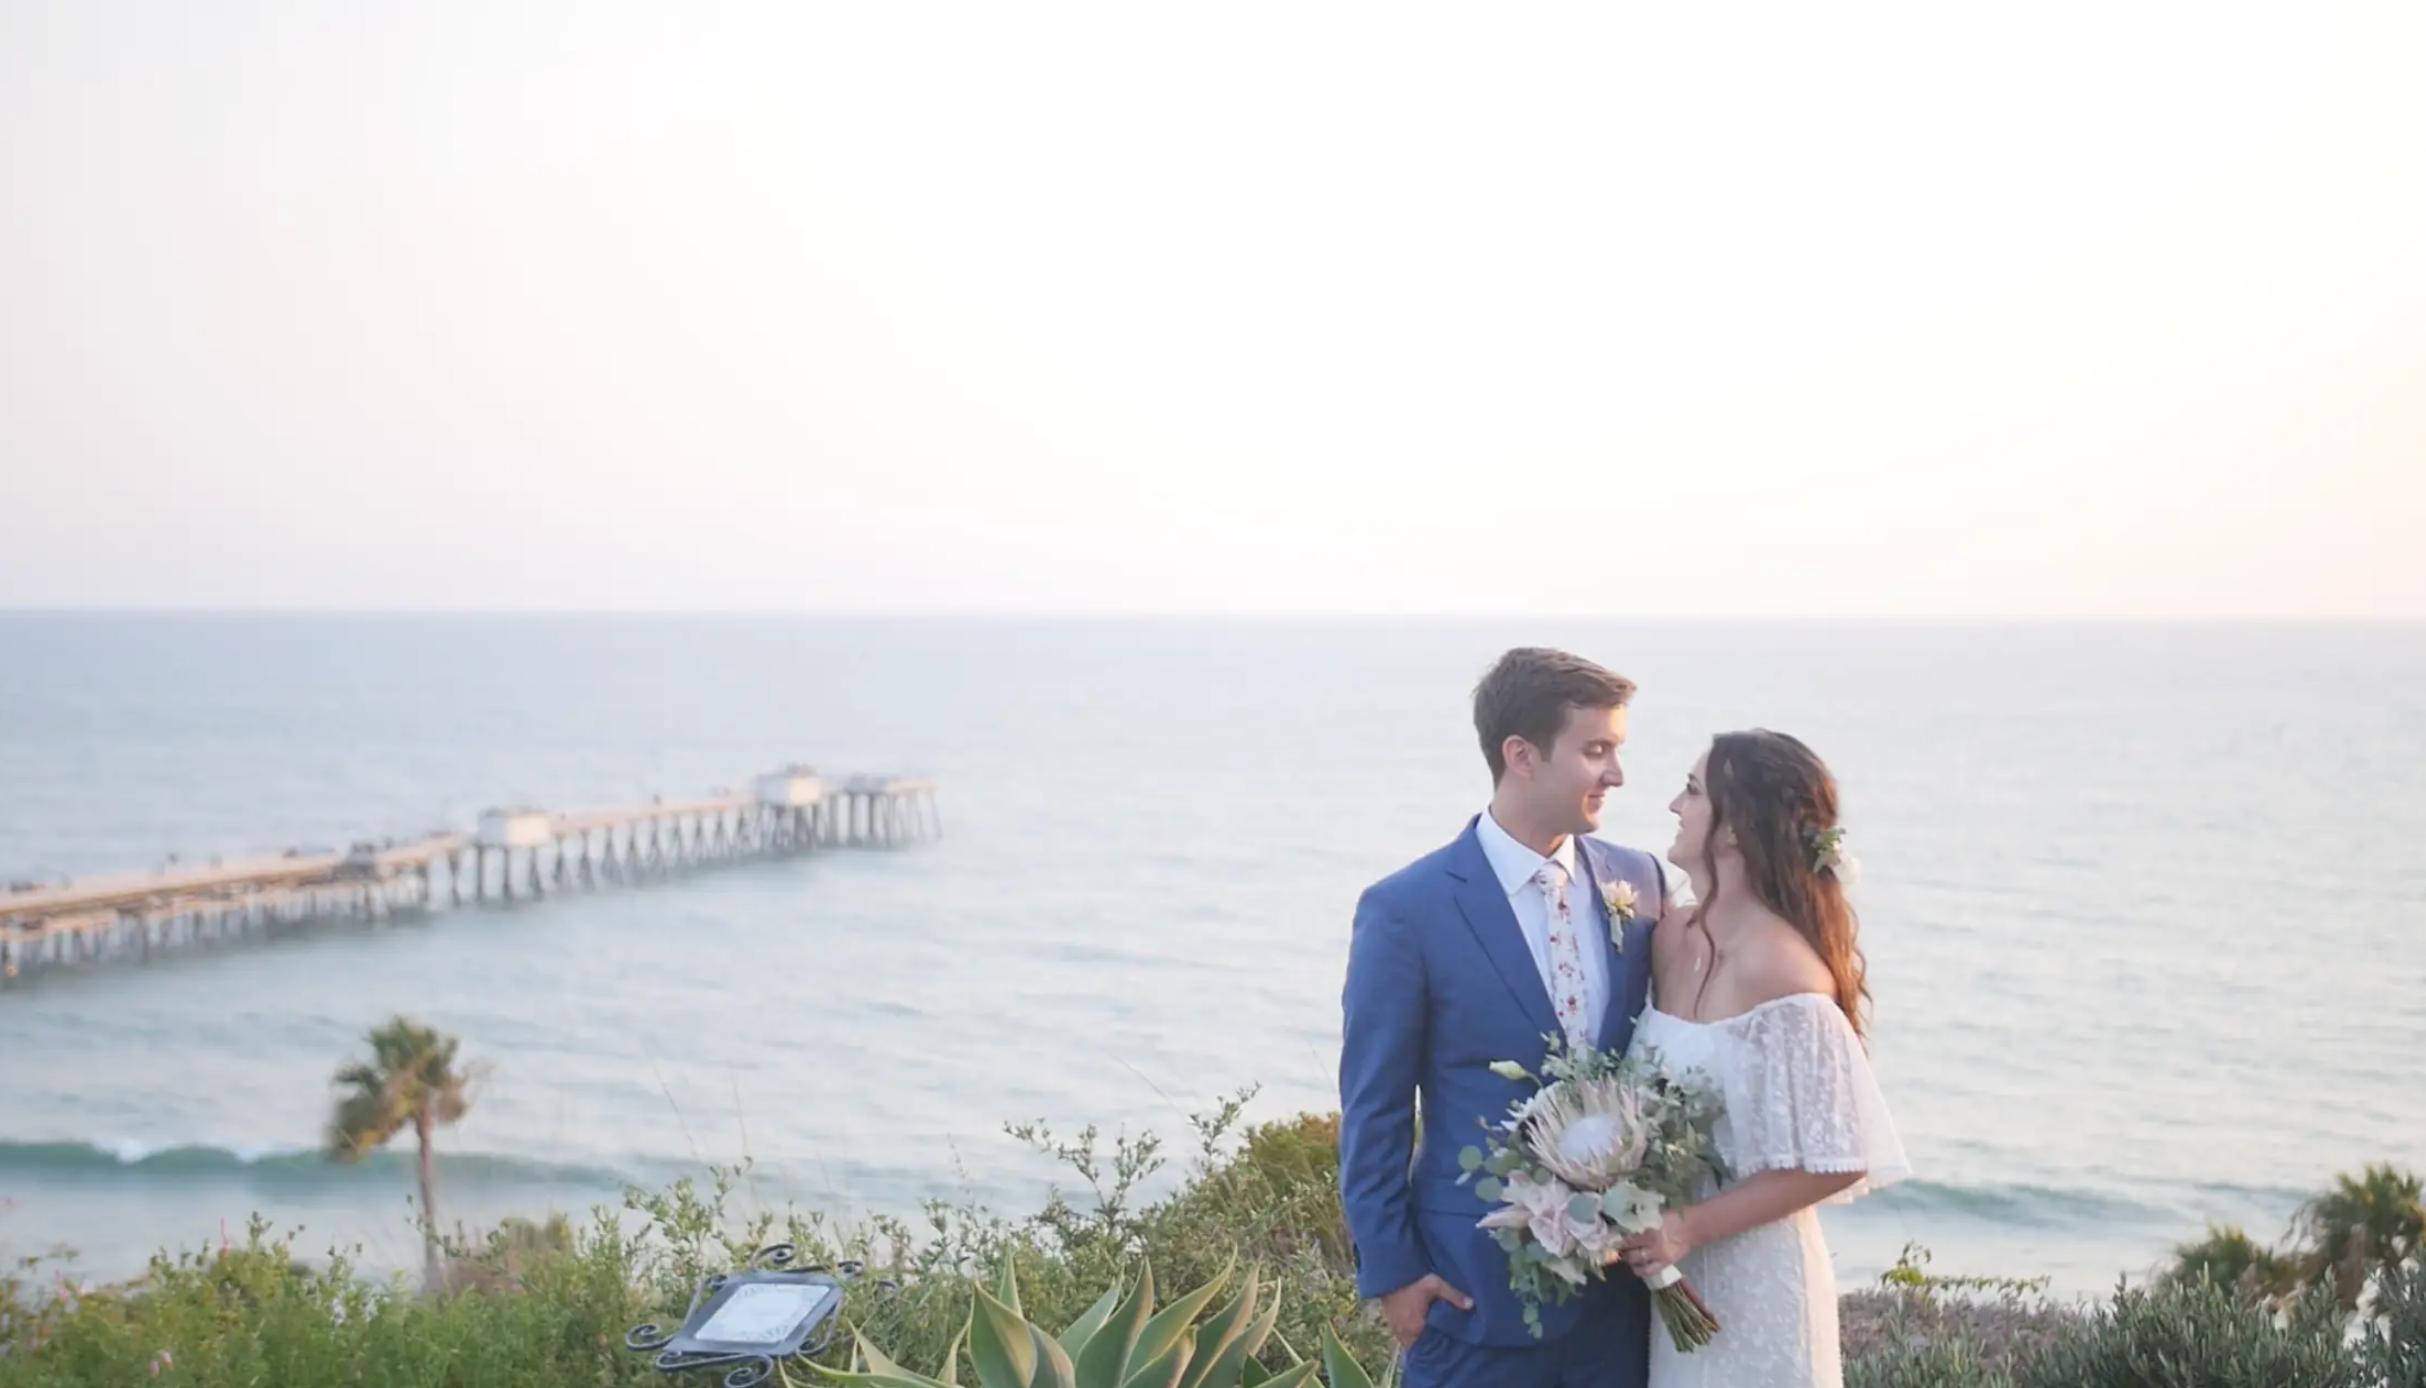 Becca + Jared | San Clemente, California | Casa Romantica